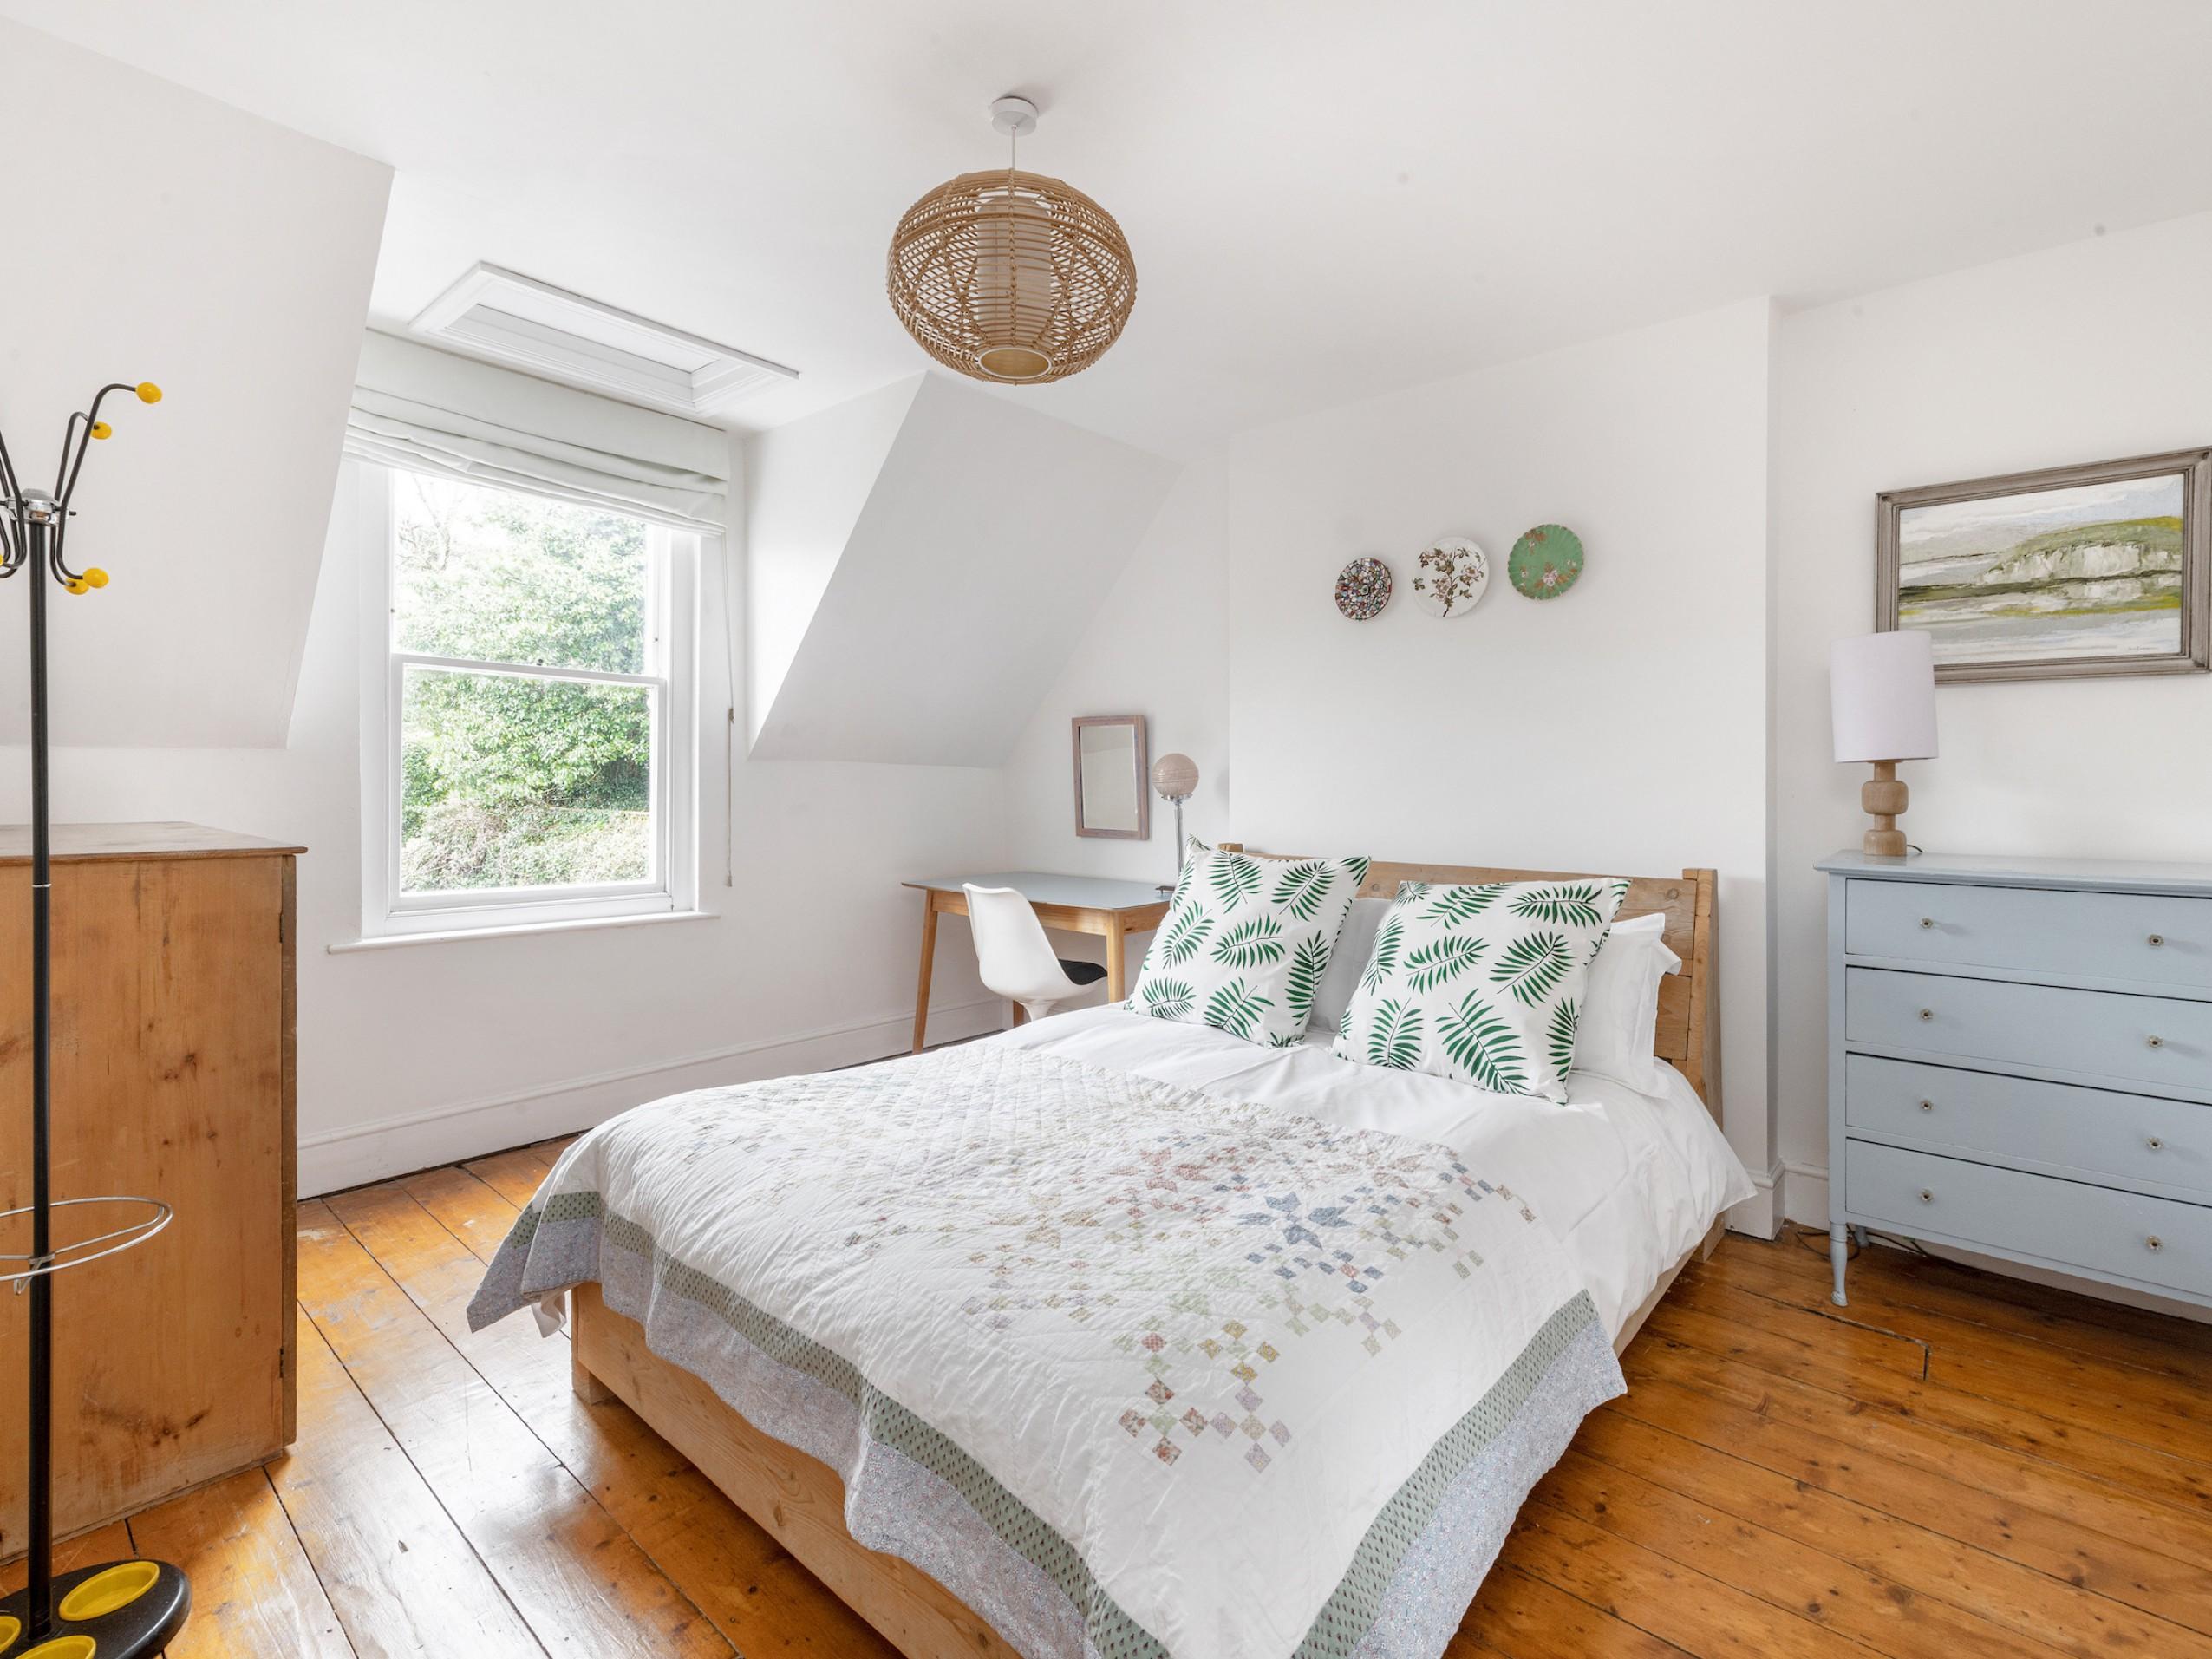 Bedroom 7, KS bed